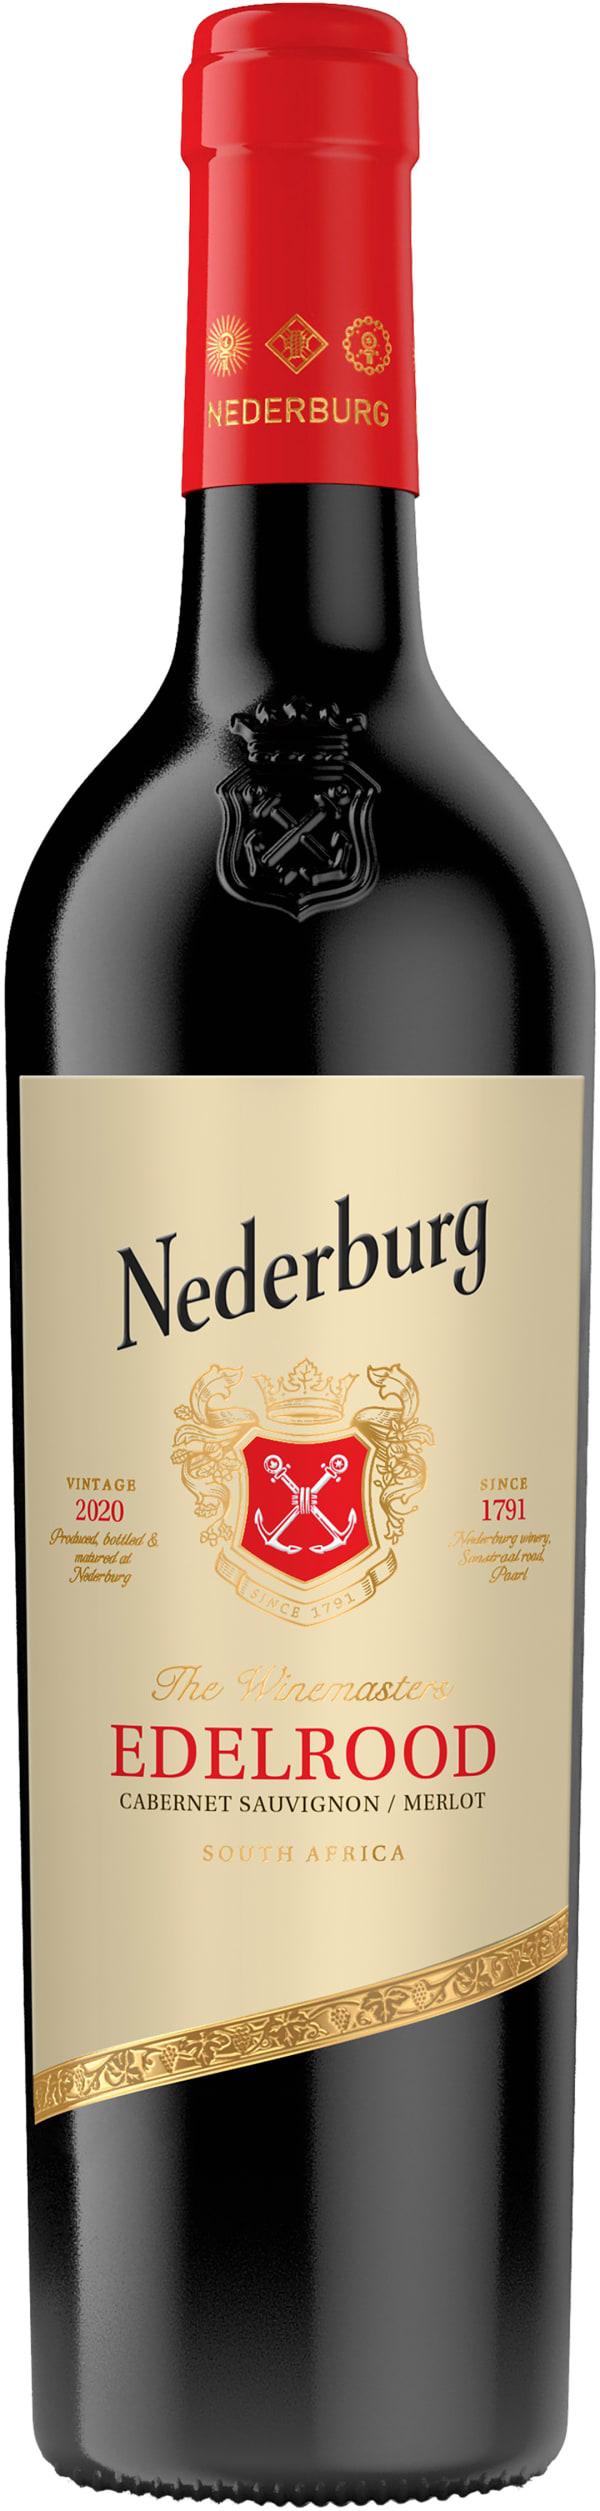 Nederburg Winemaster's Edelrood 2017